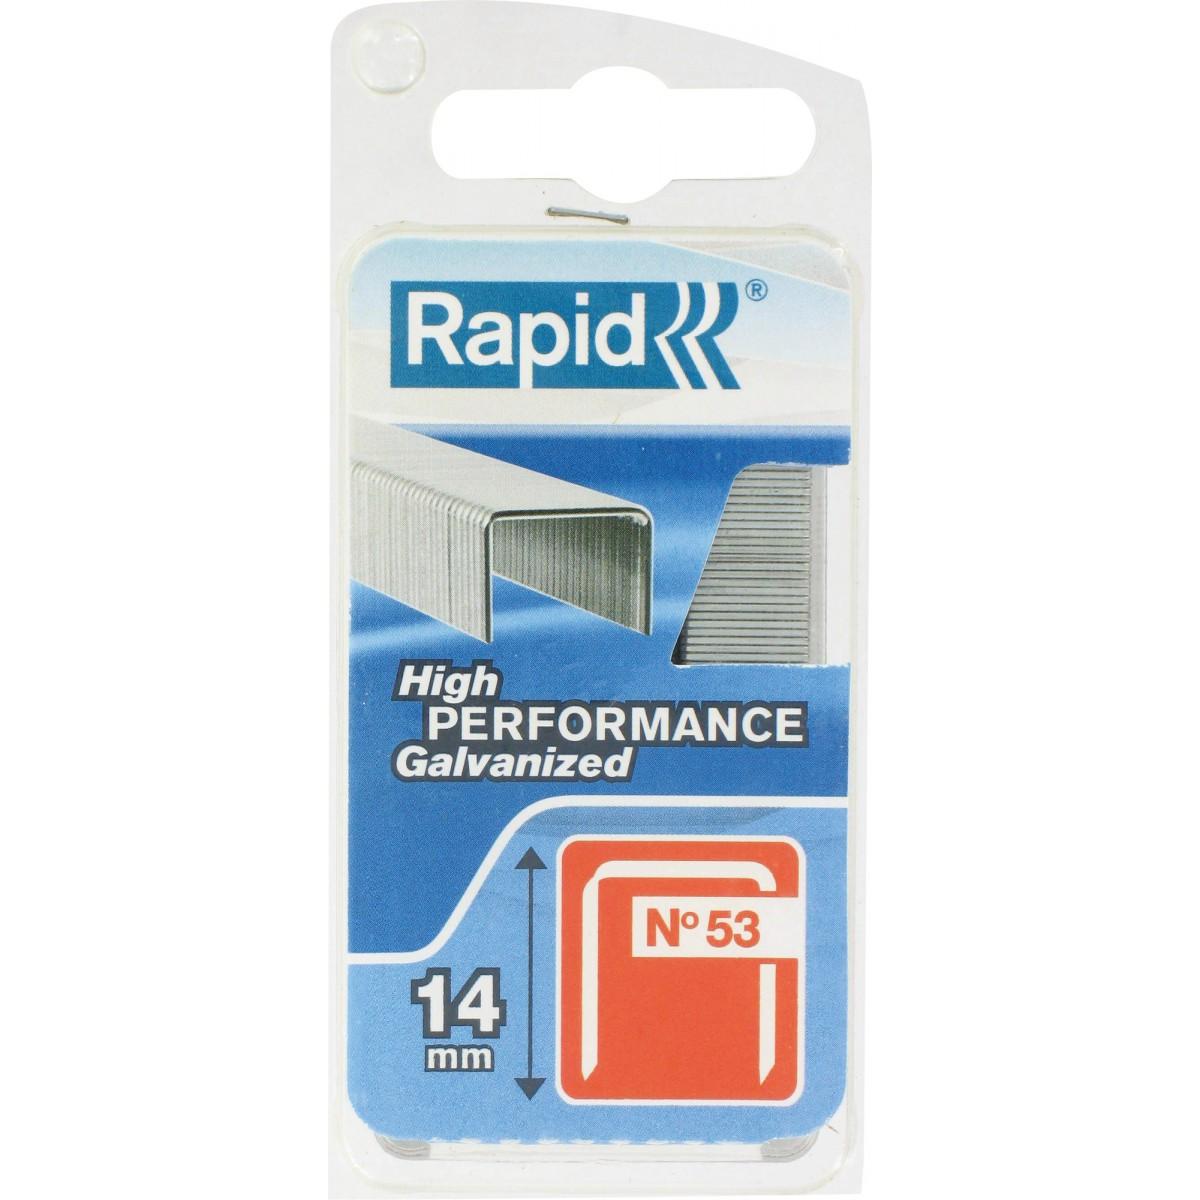 Agrafe n°53 Rapid Agraf - Hauteur 14 mm - 1080 agrafes